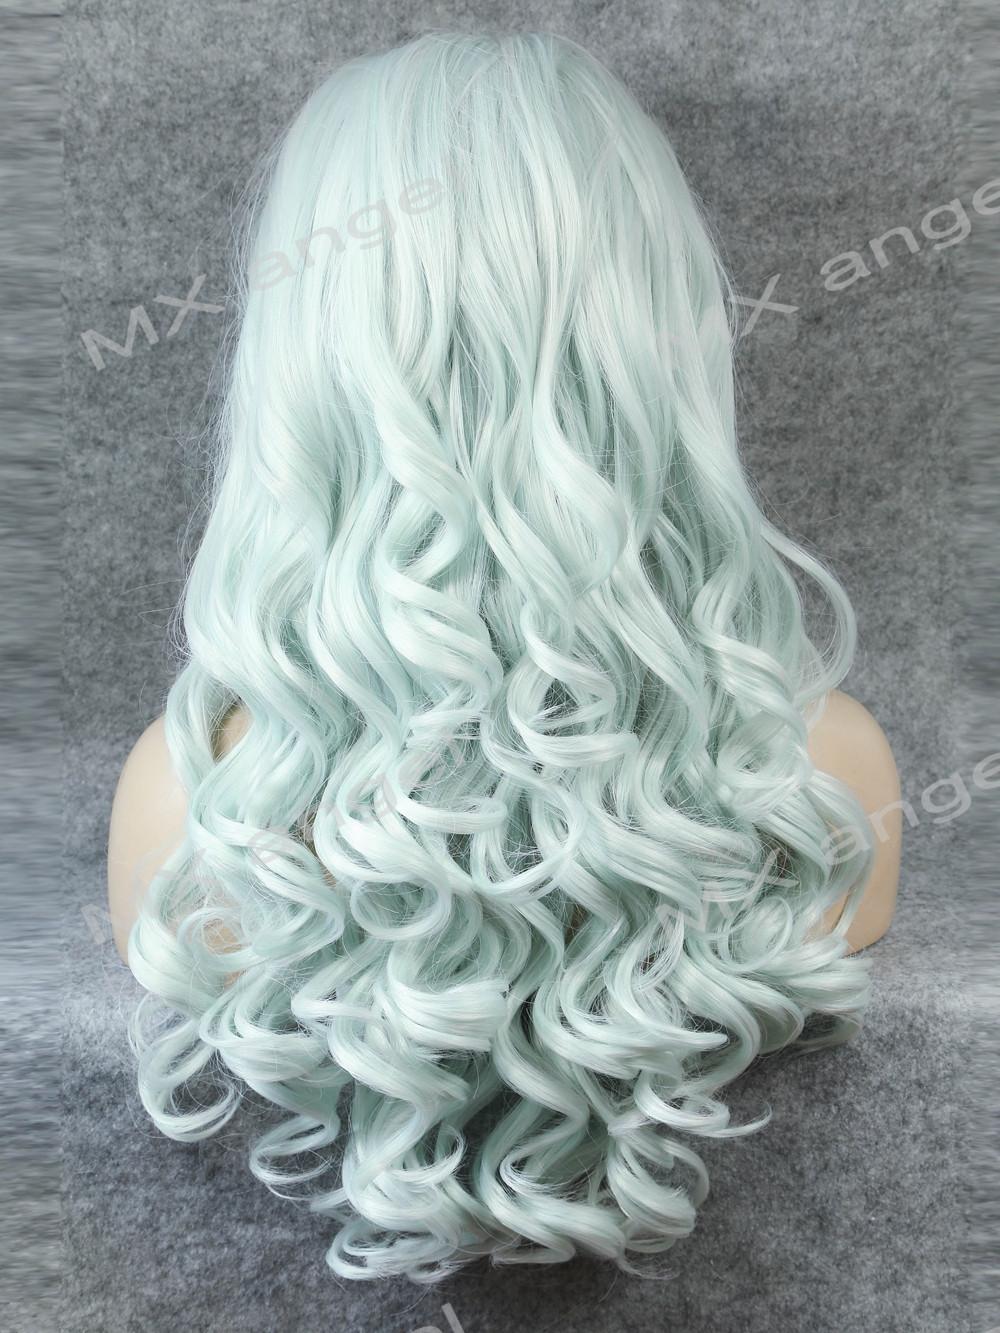 K07 Cheap 26inch Wavy Light Blue Color Synthetic Lace Front Wigs Heat Resistant Heavy Density kanekalon Fiber Ladies Wigs